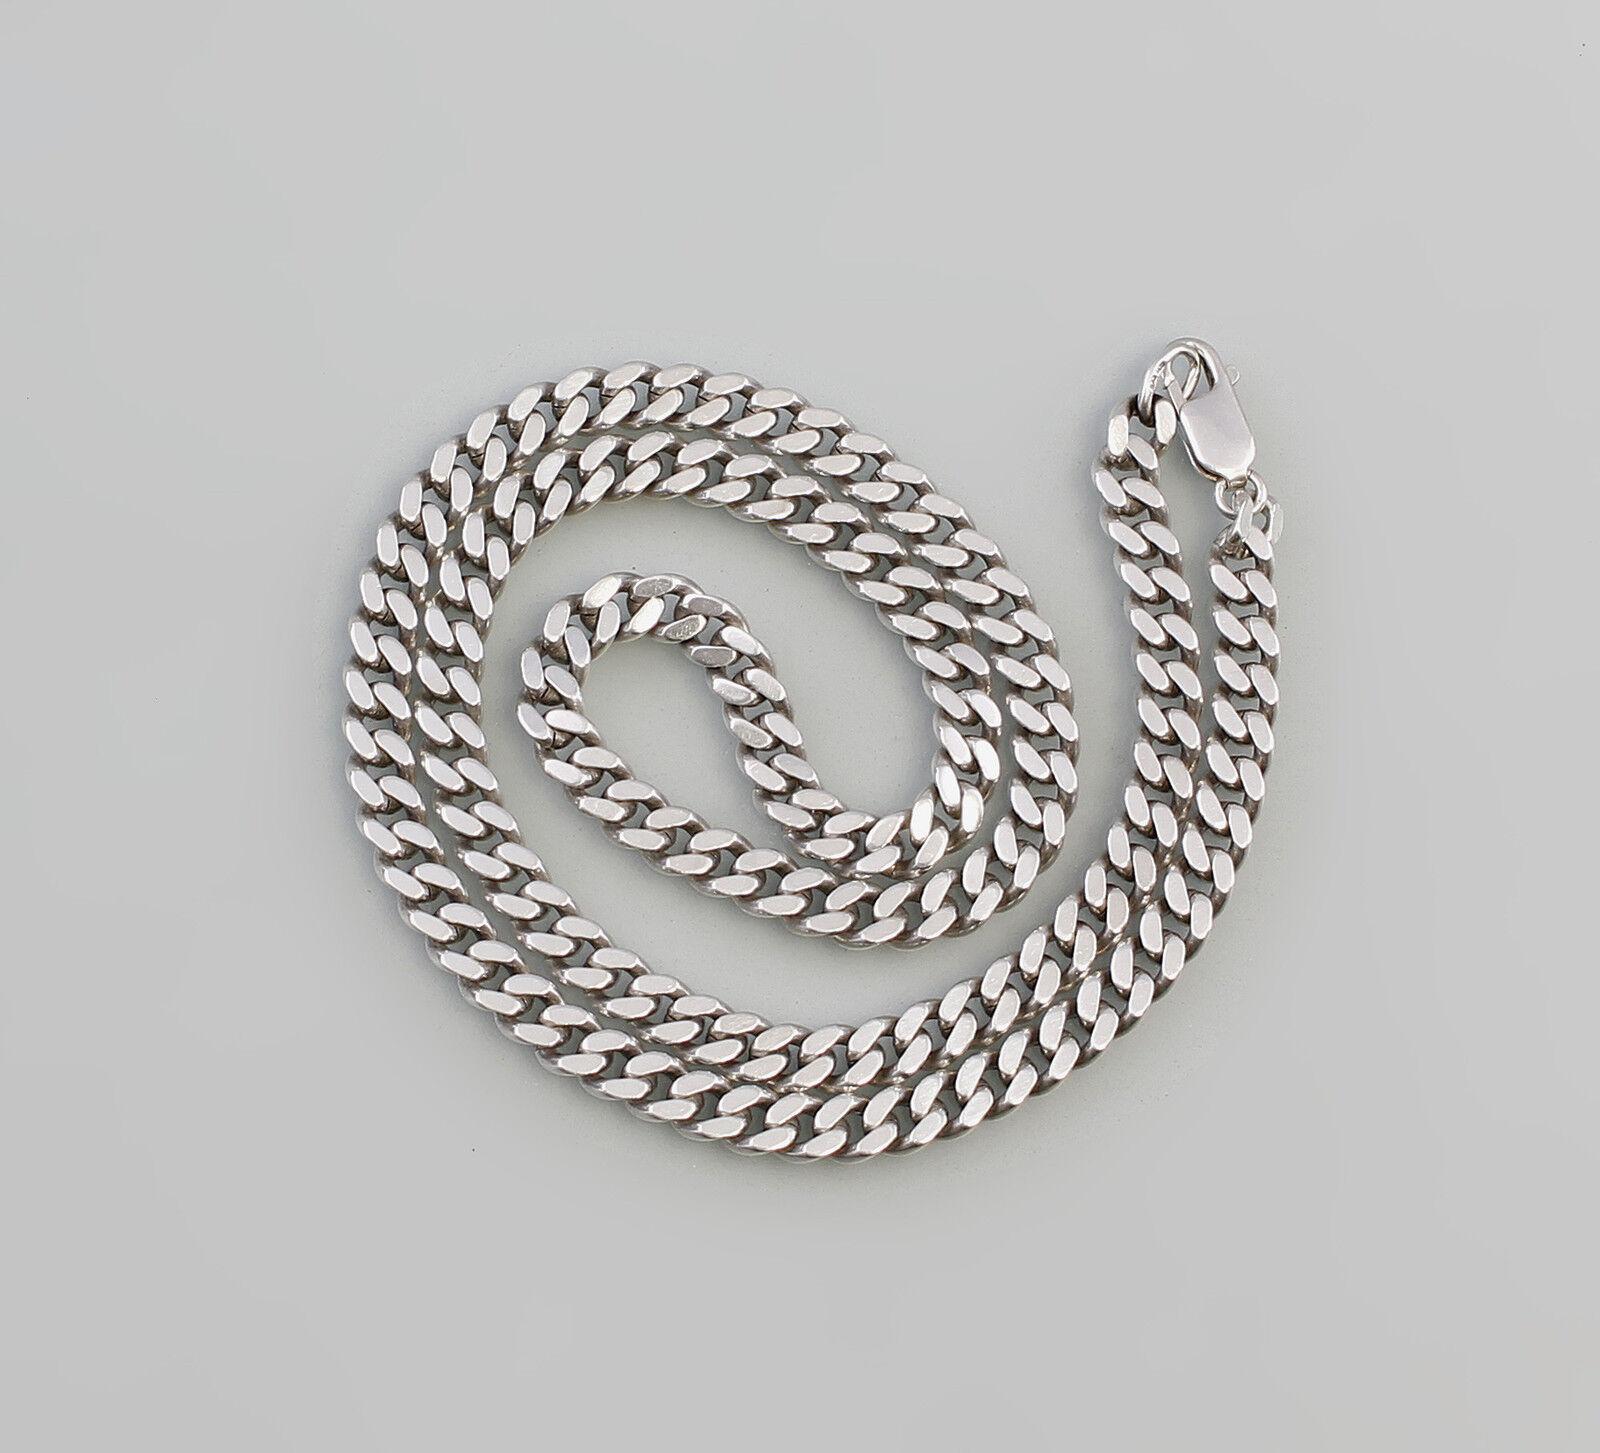 925er silver Flachpanzer - Kette 99825381